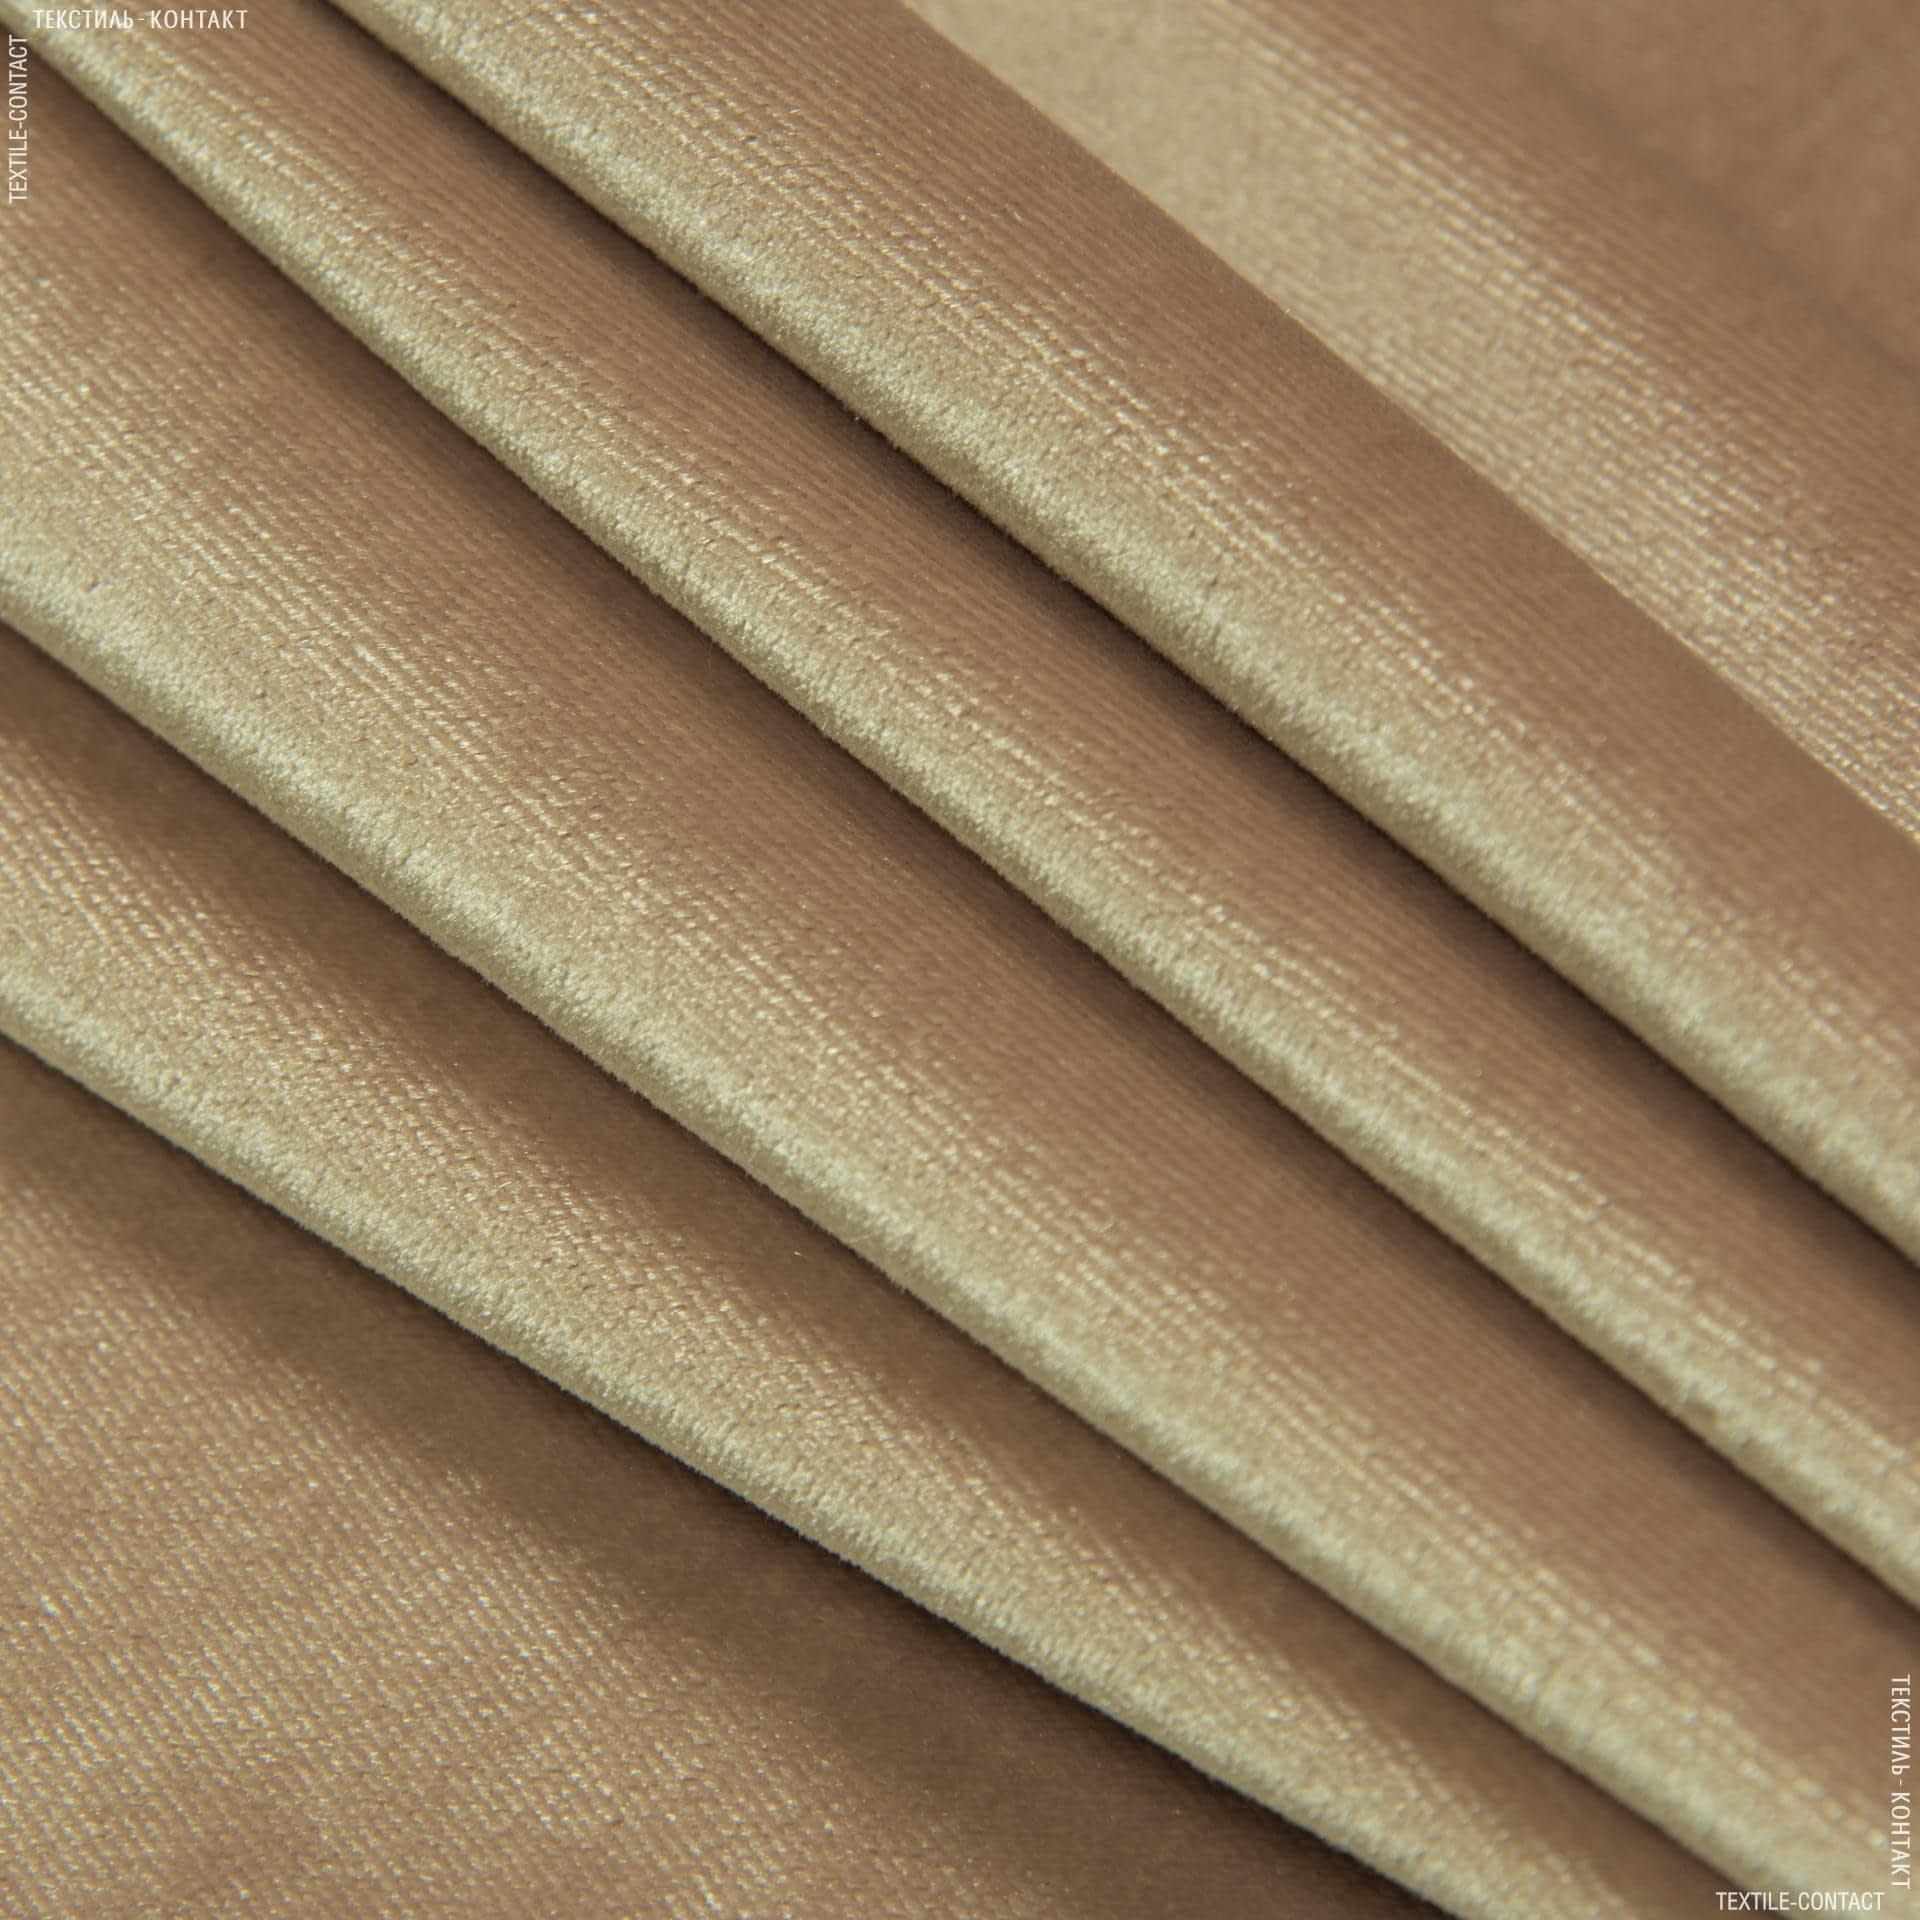 Тканини для суконь - Оксамит стрейч бежевий